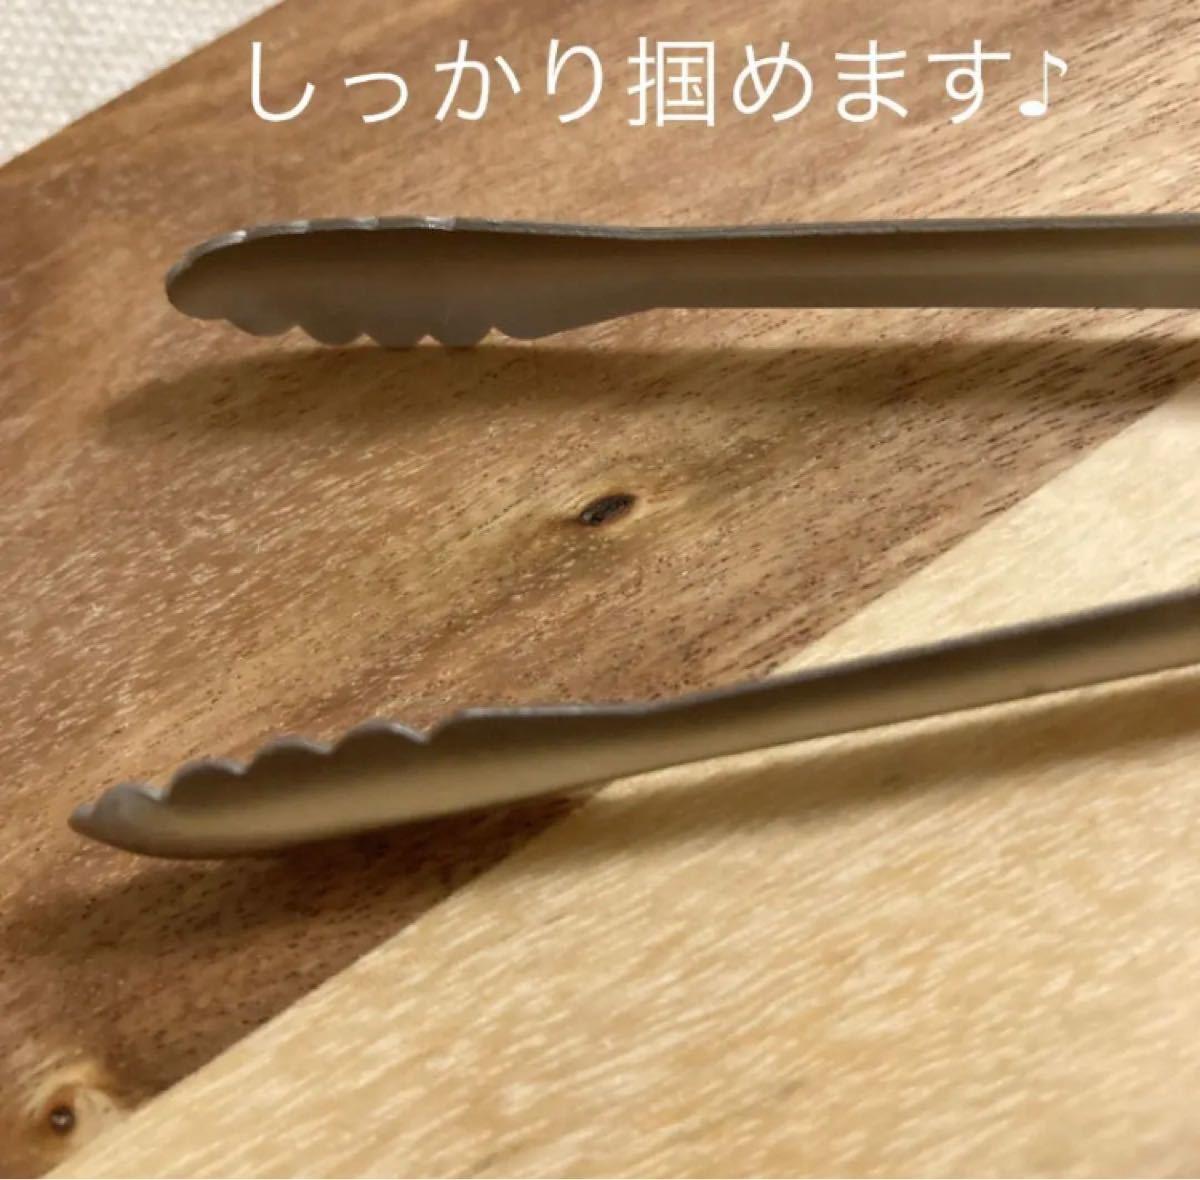 Made in TSUBAME 薬味3点セット 新品 日本製 新潟県燕市燕三条 刻印入り おろし金 ミニトング 薬味小皿